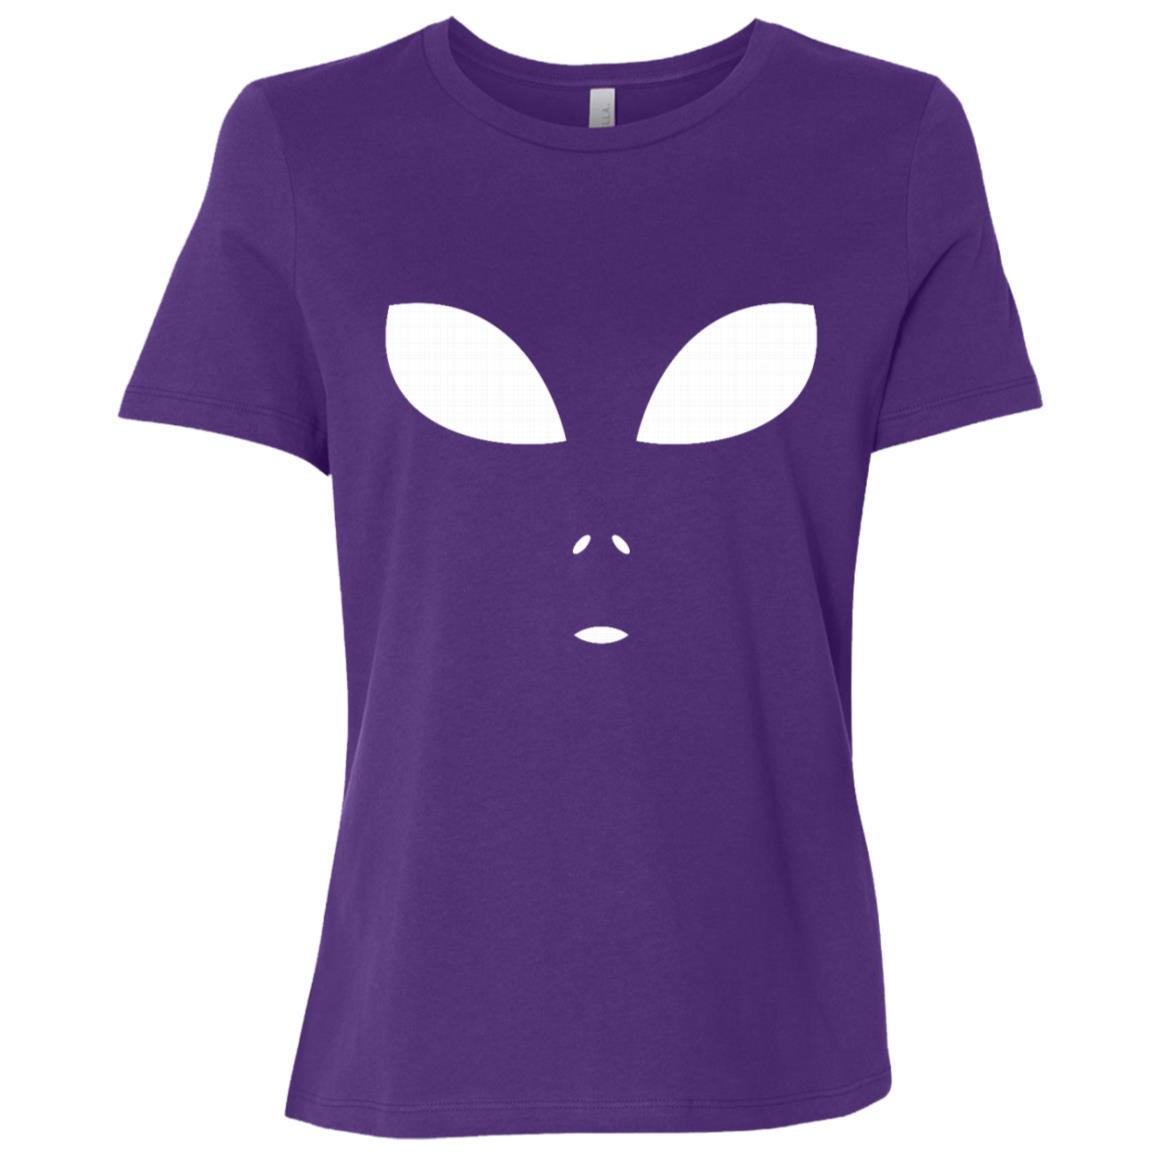 Funny Alien Face Scary Science Fiction Geek Gift Women Short Sleeve T-Shirt